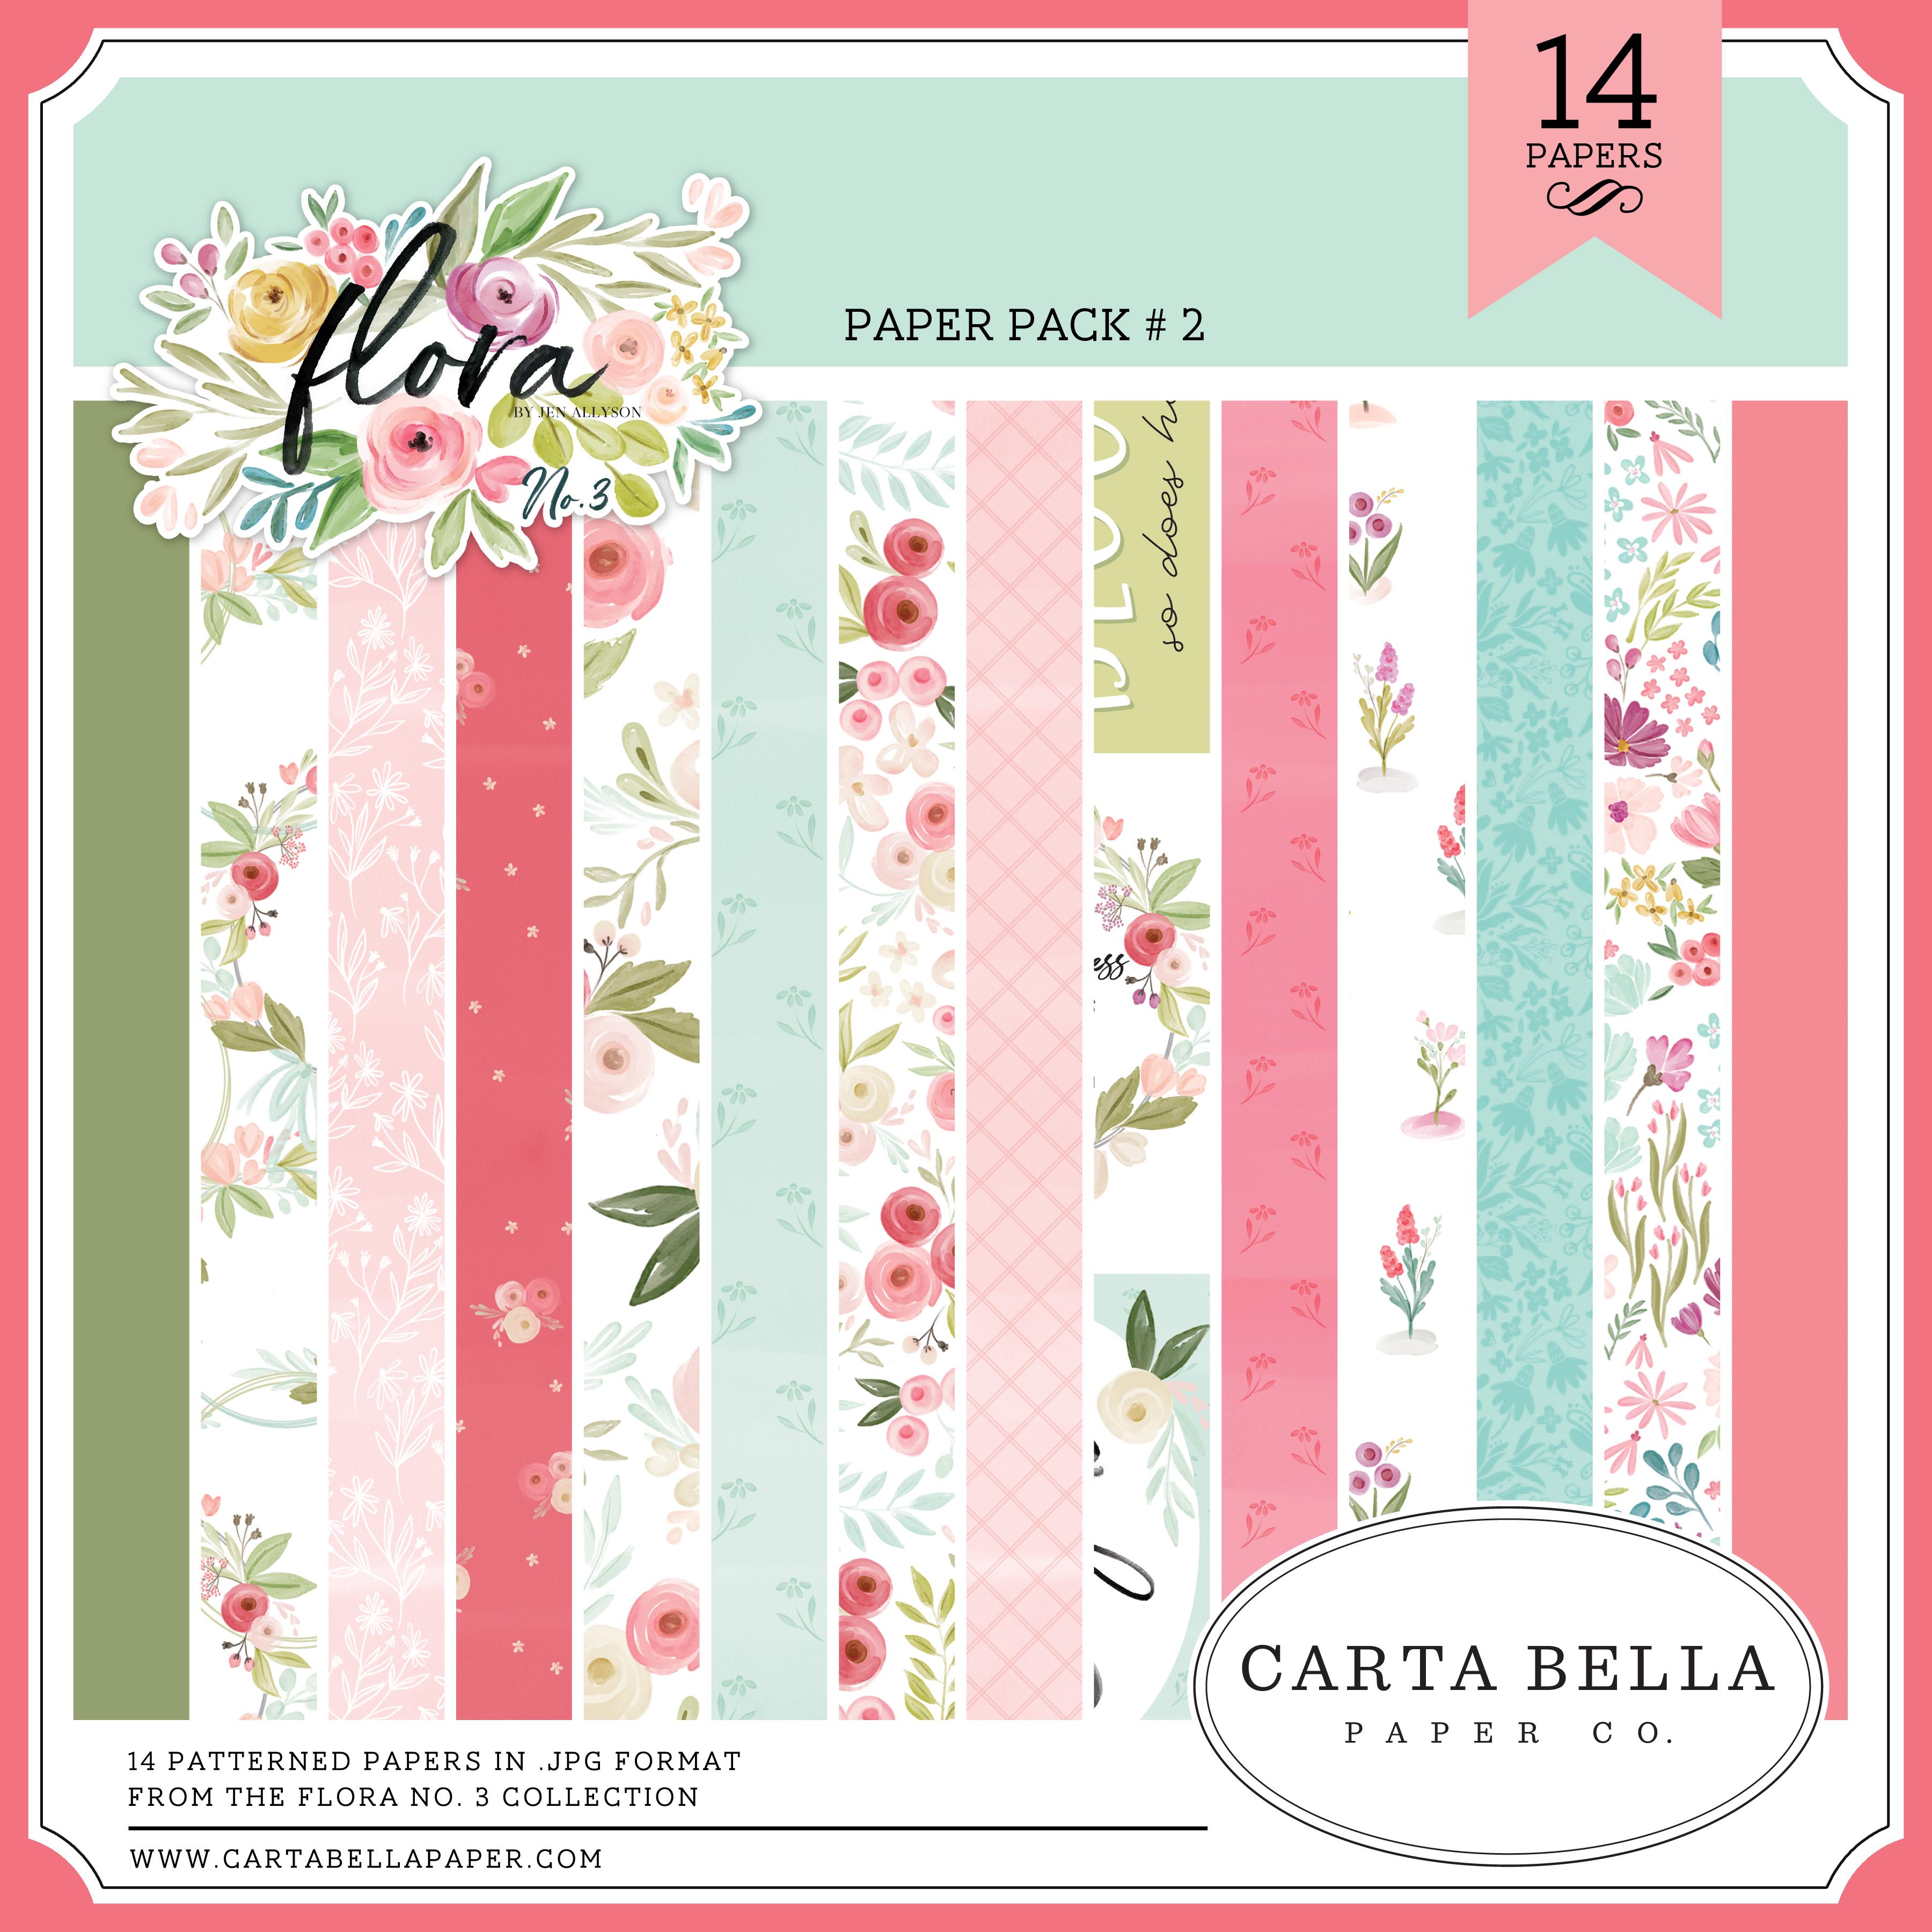 Flora No. 3 Paper Pack #2